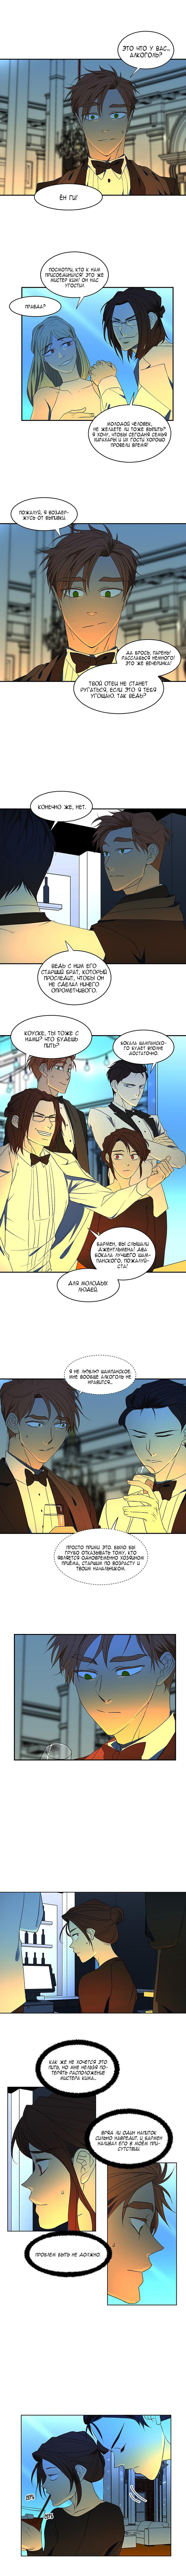 https://r1.ninemanga.com/comics/pic2/27/32027/415457/1530933082604.jpg Page 2